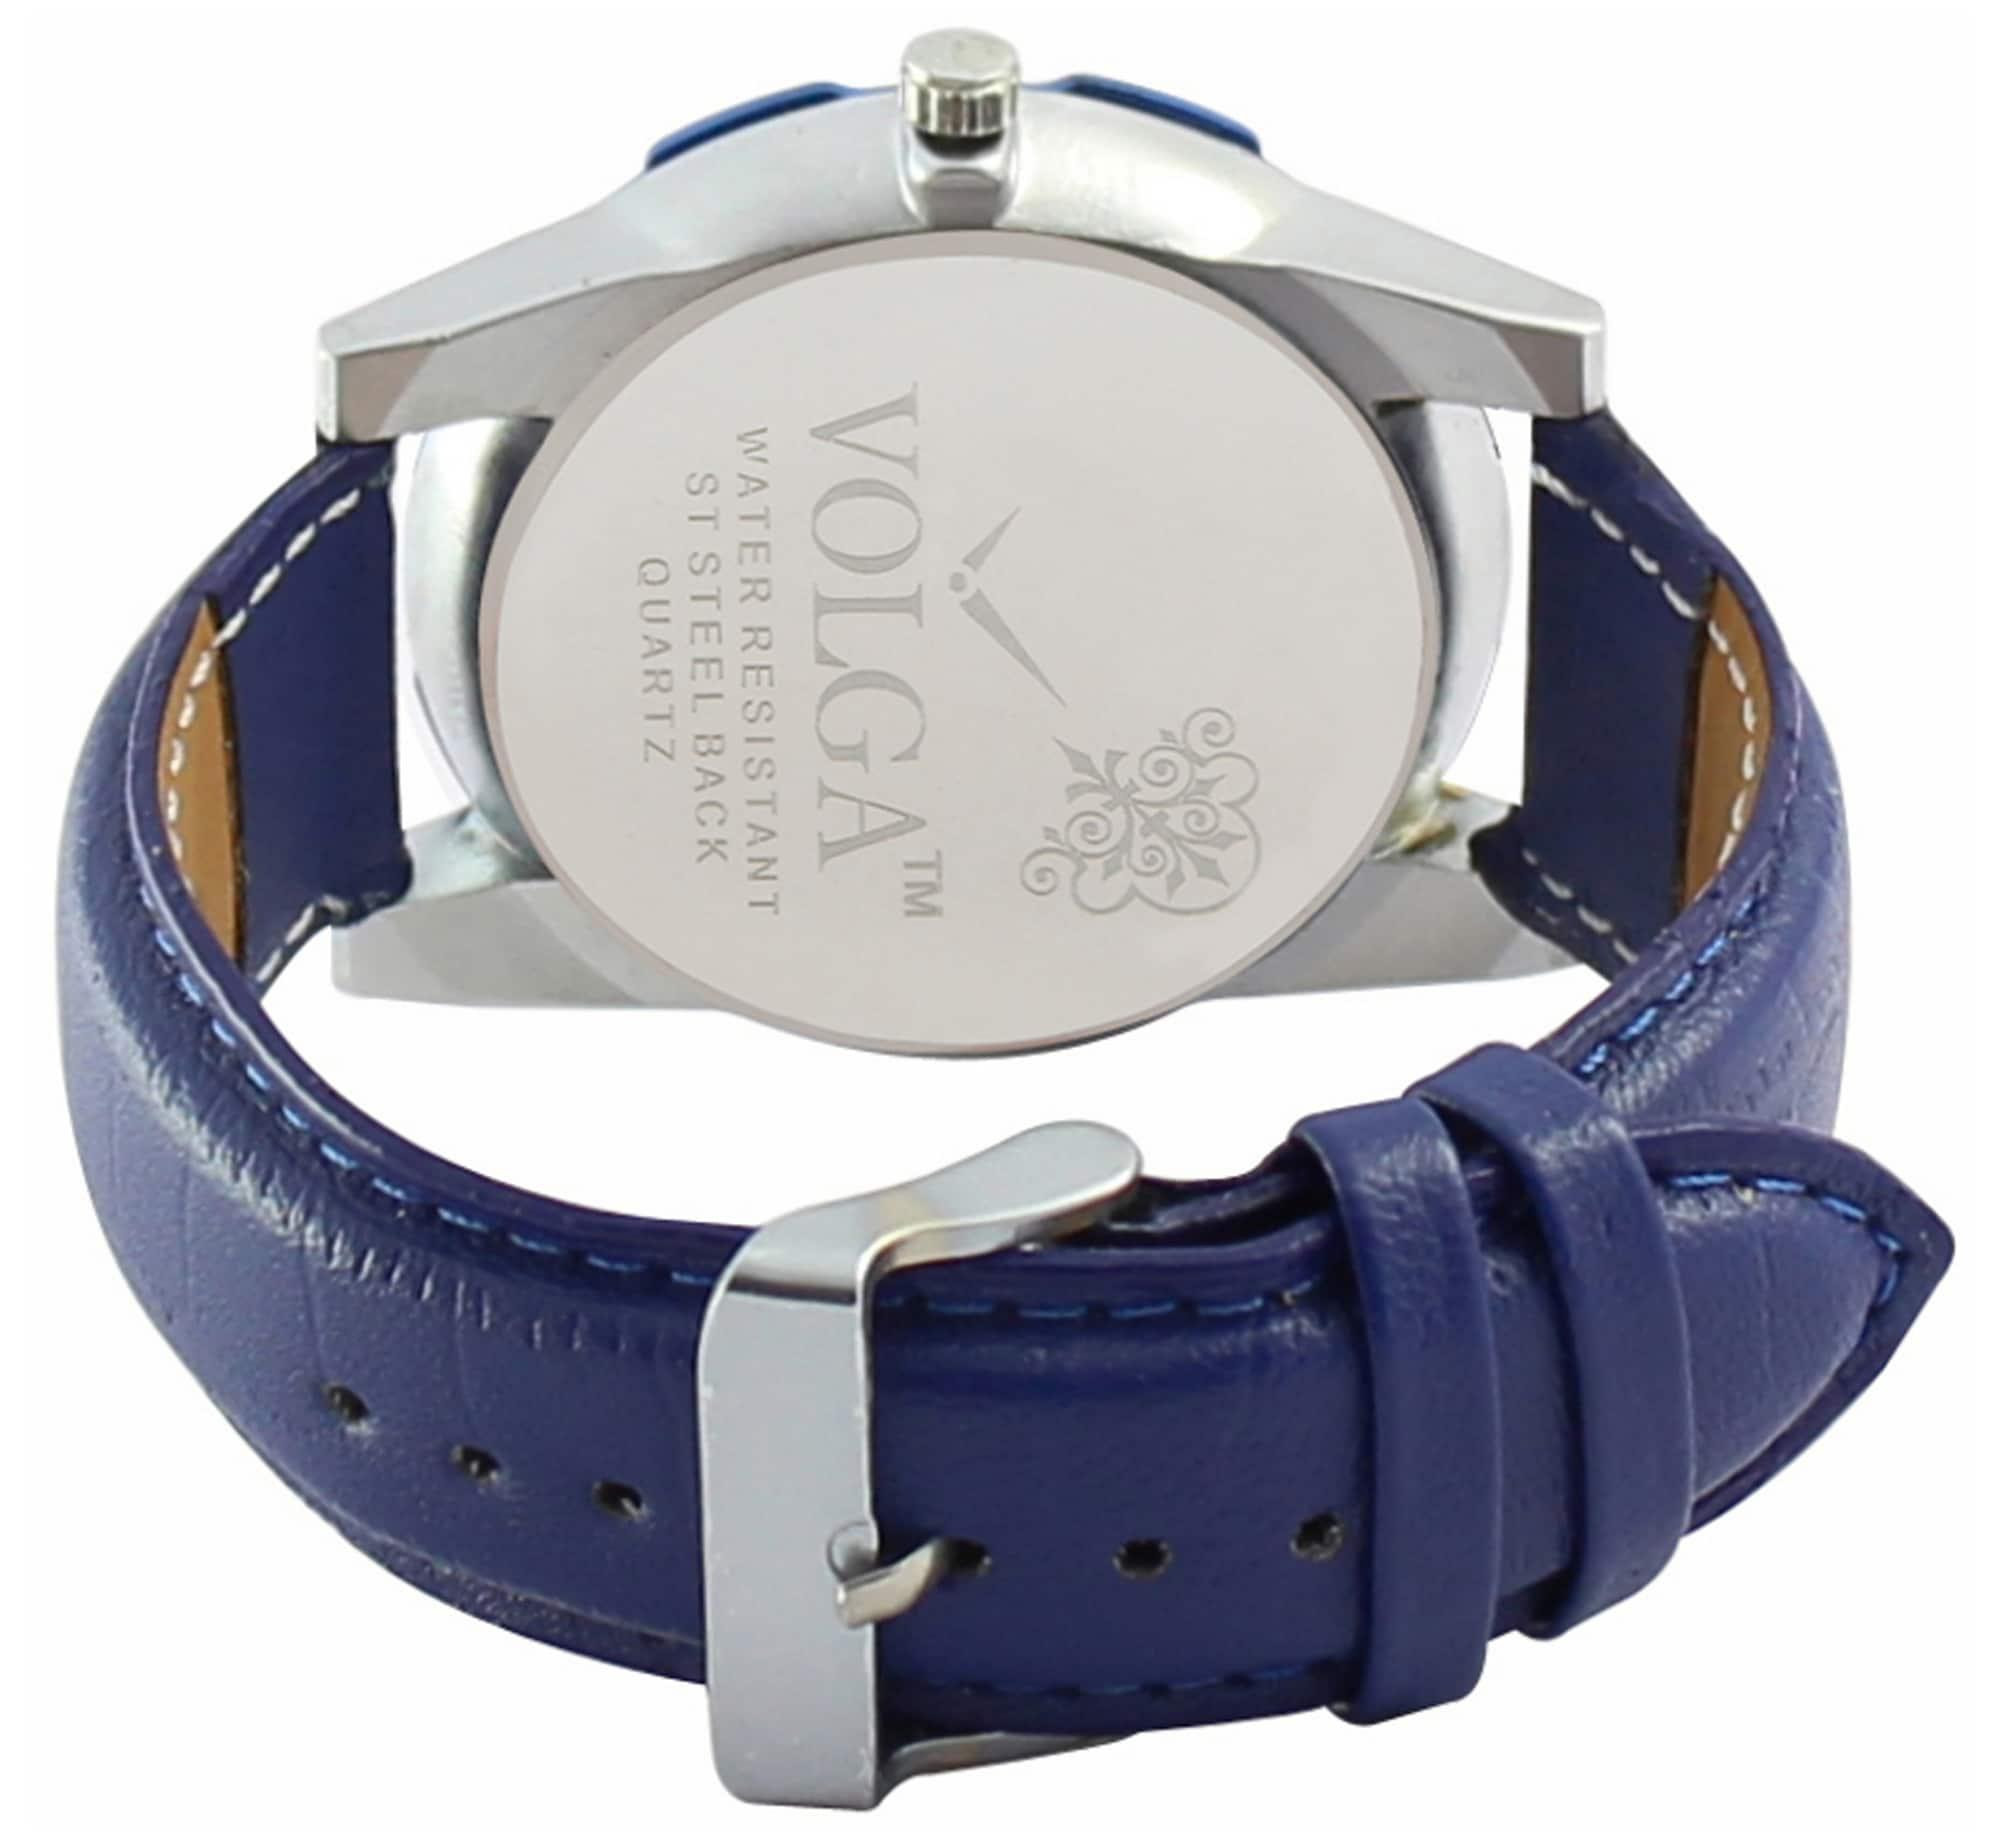 Klassy Collection Volga Fashionable Design Analog Watch